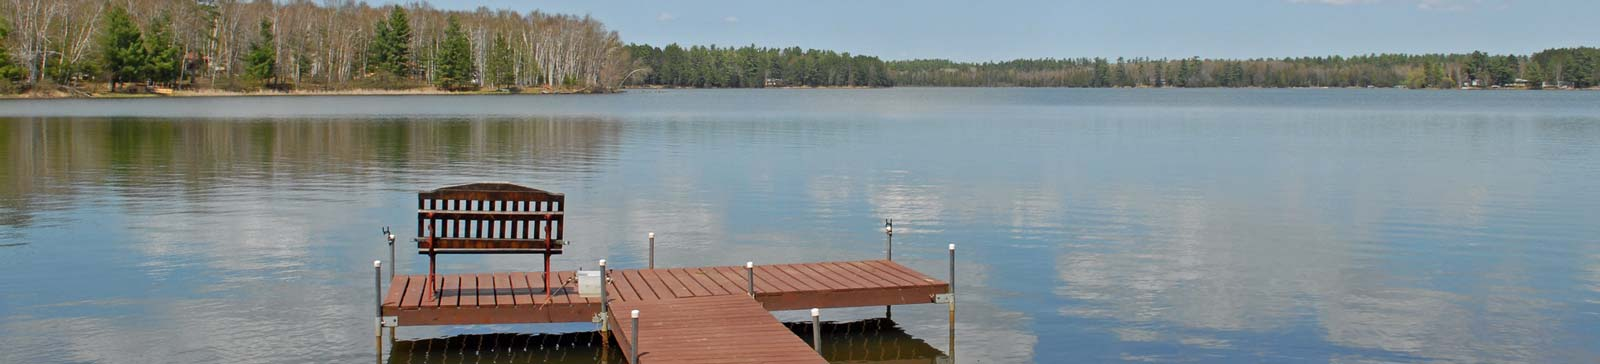 salmon-mundi-lago-norte